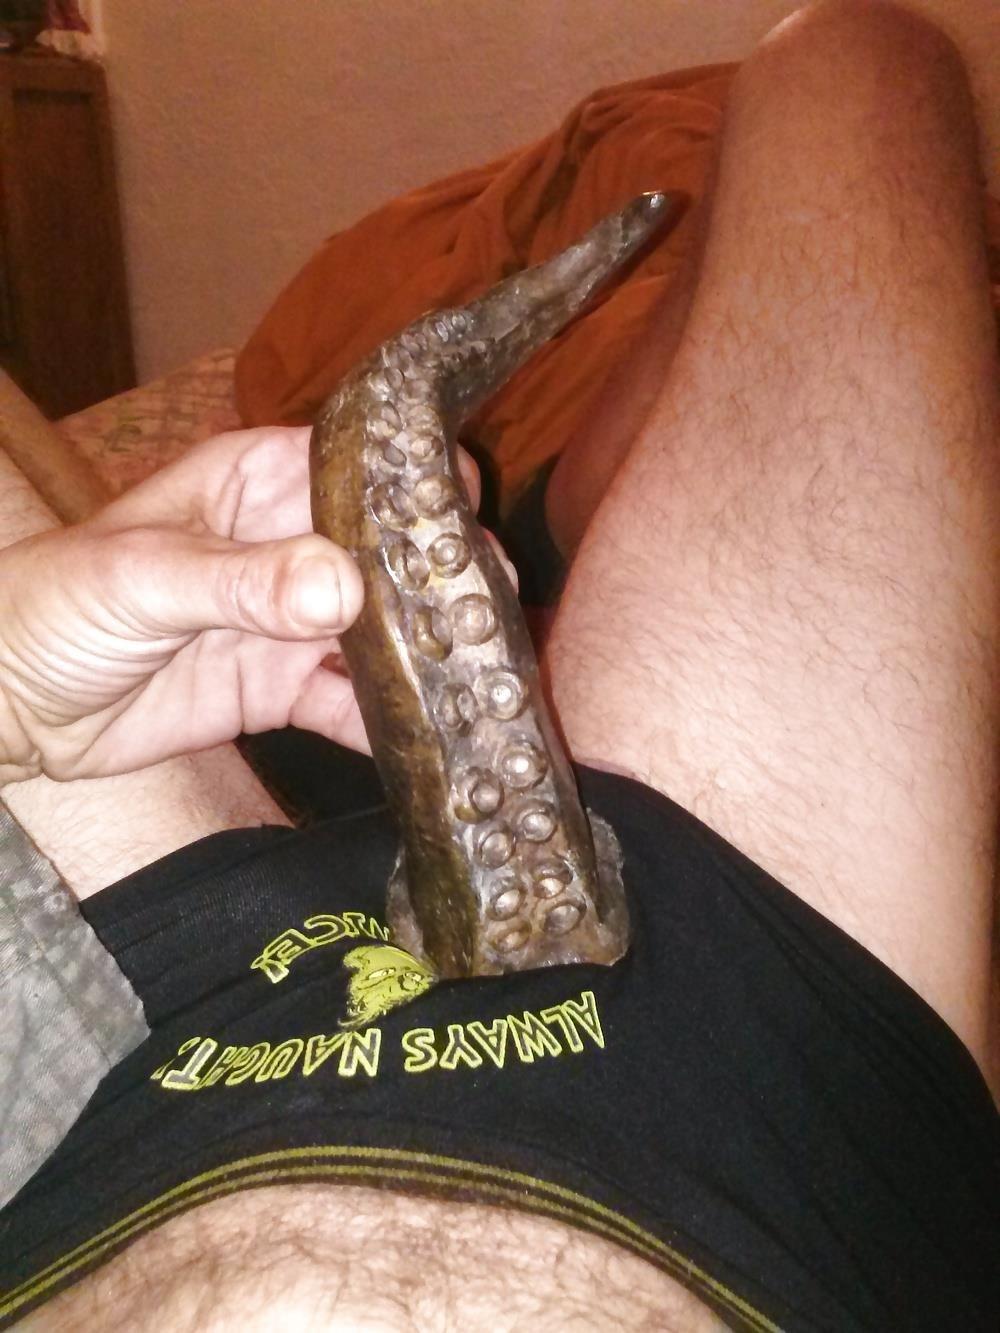 Lesbian granny porn free-4187